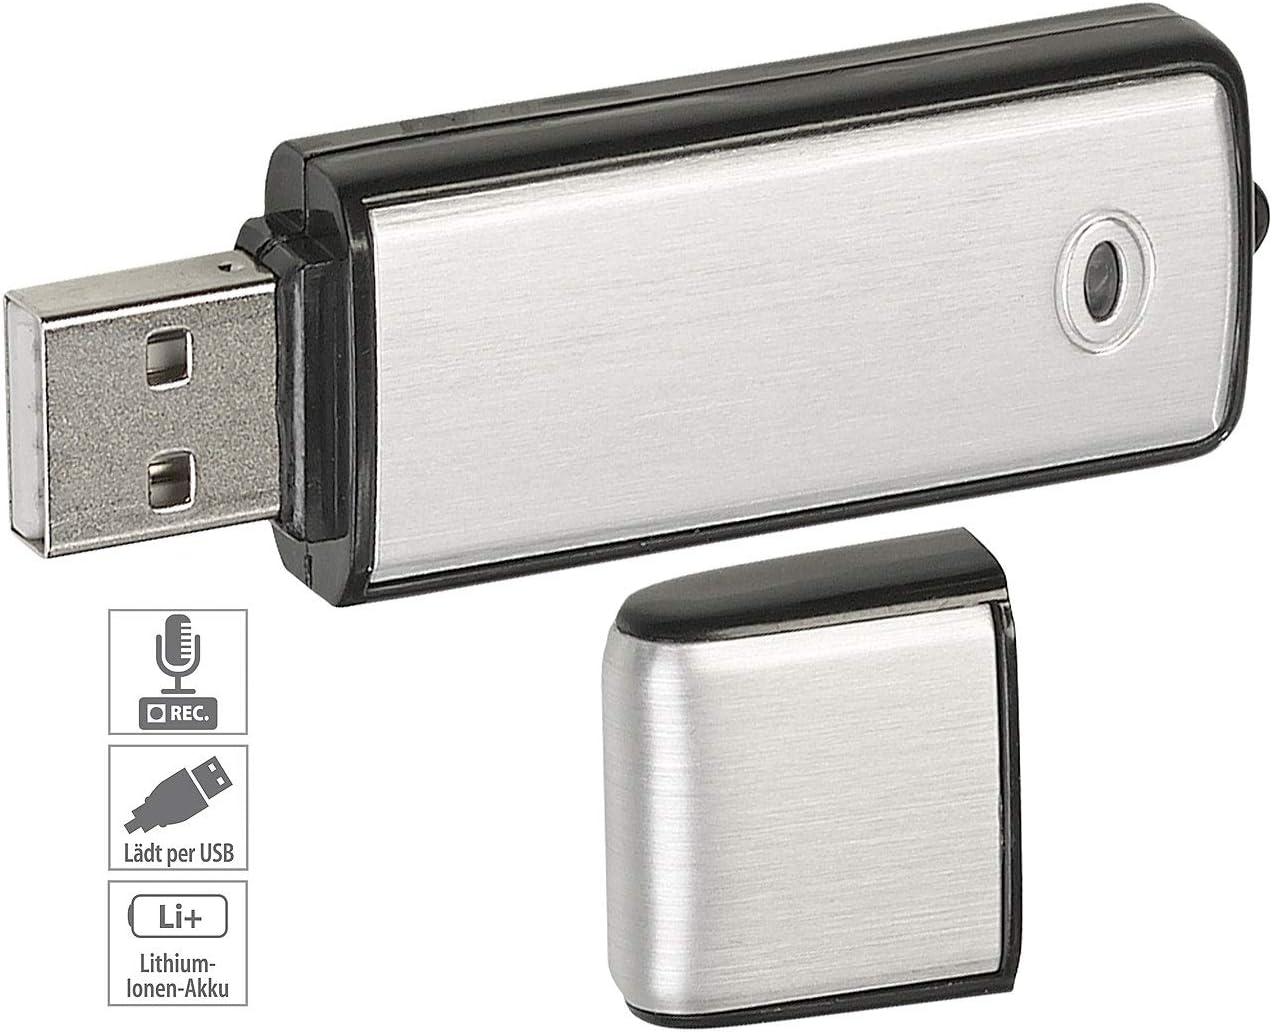 NEU PROFI VOICE REKORDER USBSTICK SPY REC GEHEIM SPRACHAUFNAHME TONAUFNAHME A112